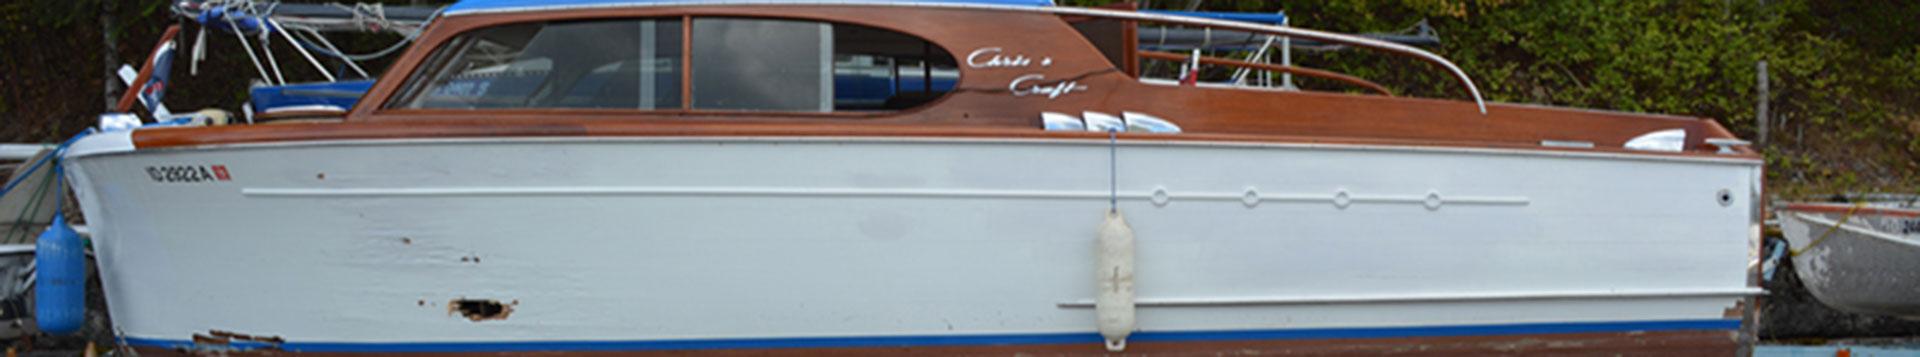 Restoration of a 1946 Chris-Craft Sedan Cruiser